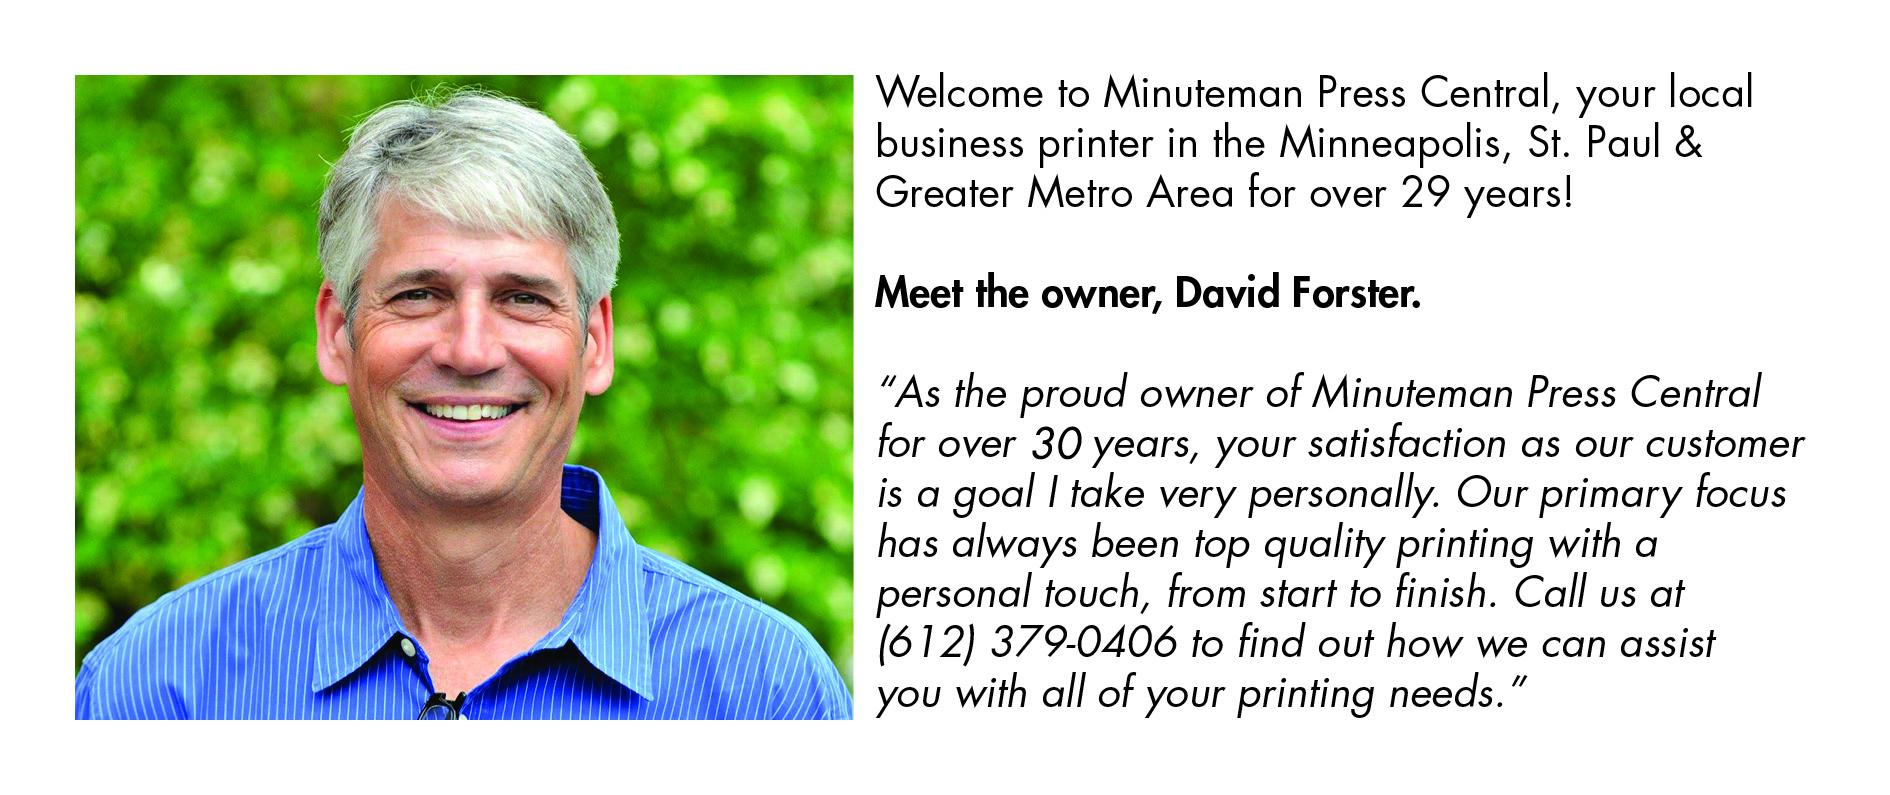 David Forster, owner of Minuteman Press Central